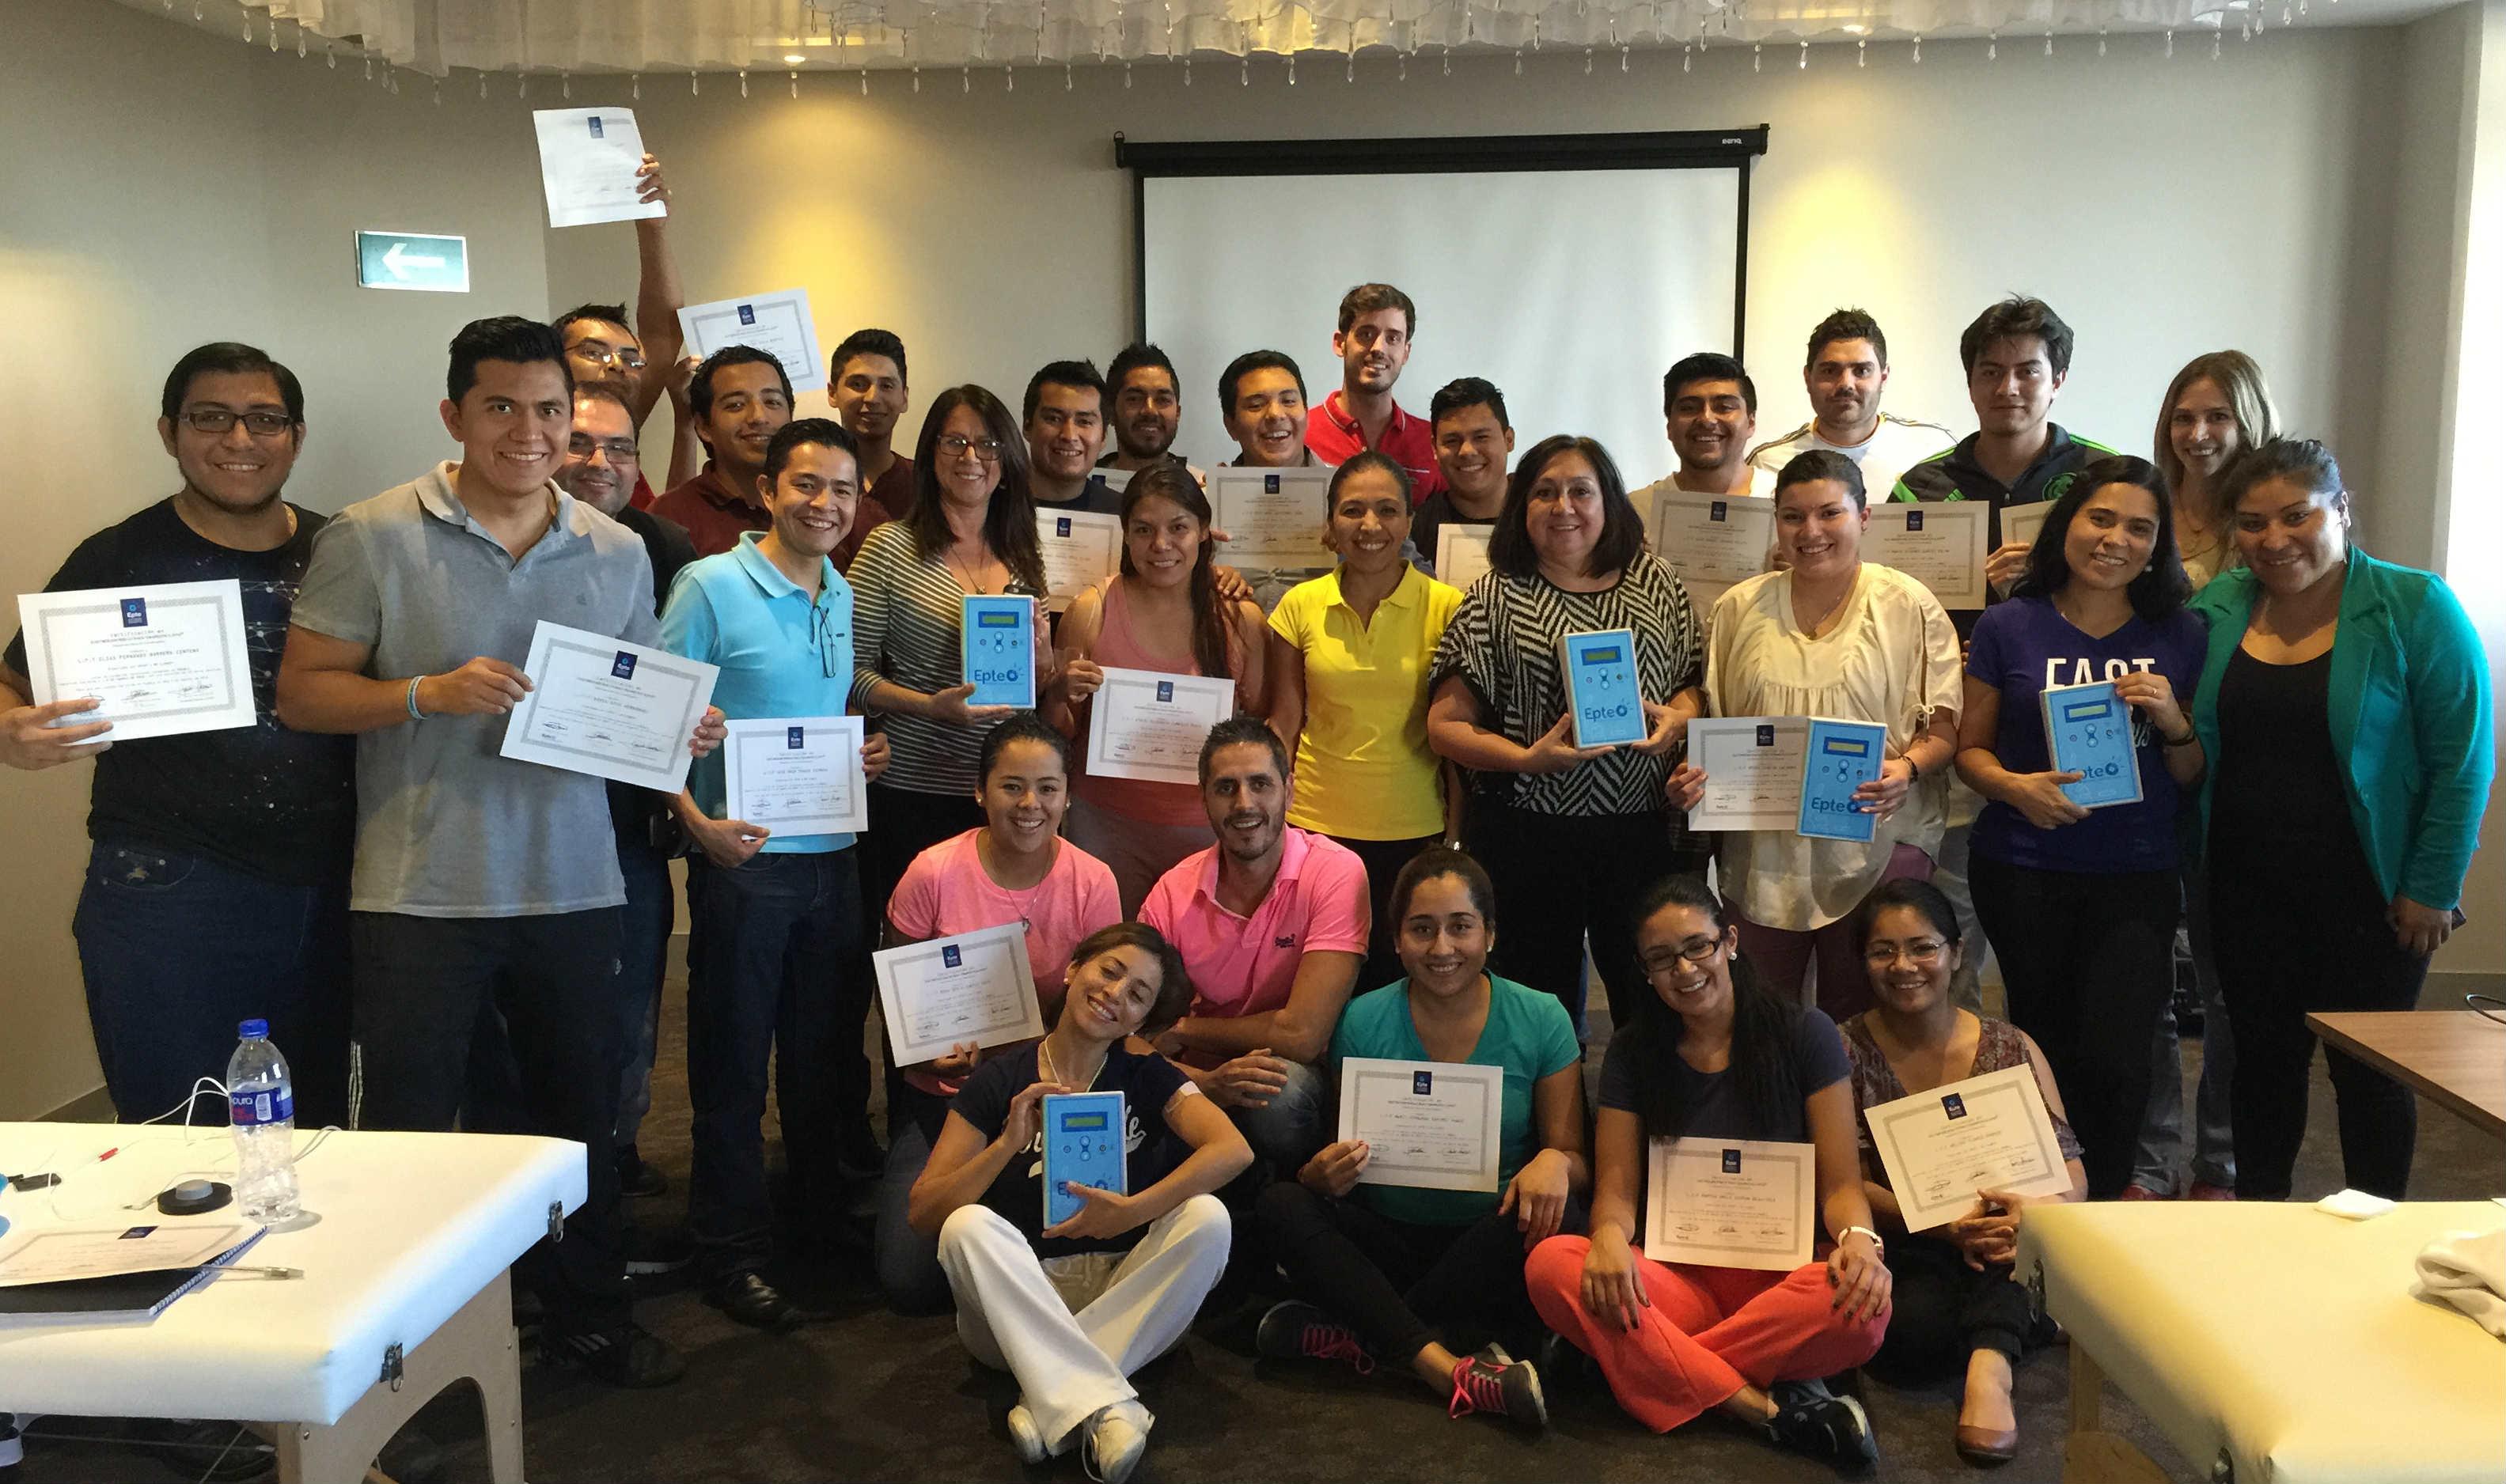 Primeros alumnos del curso de electrolisis percutanea terapeutica EPTE en Puebla, México